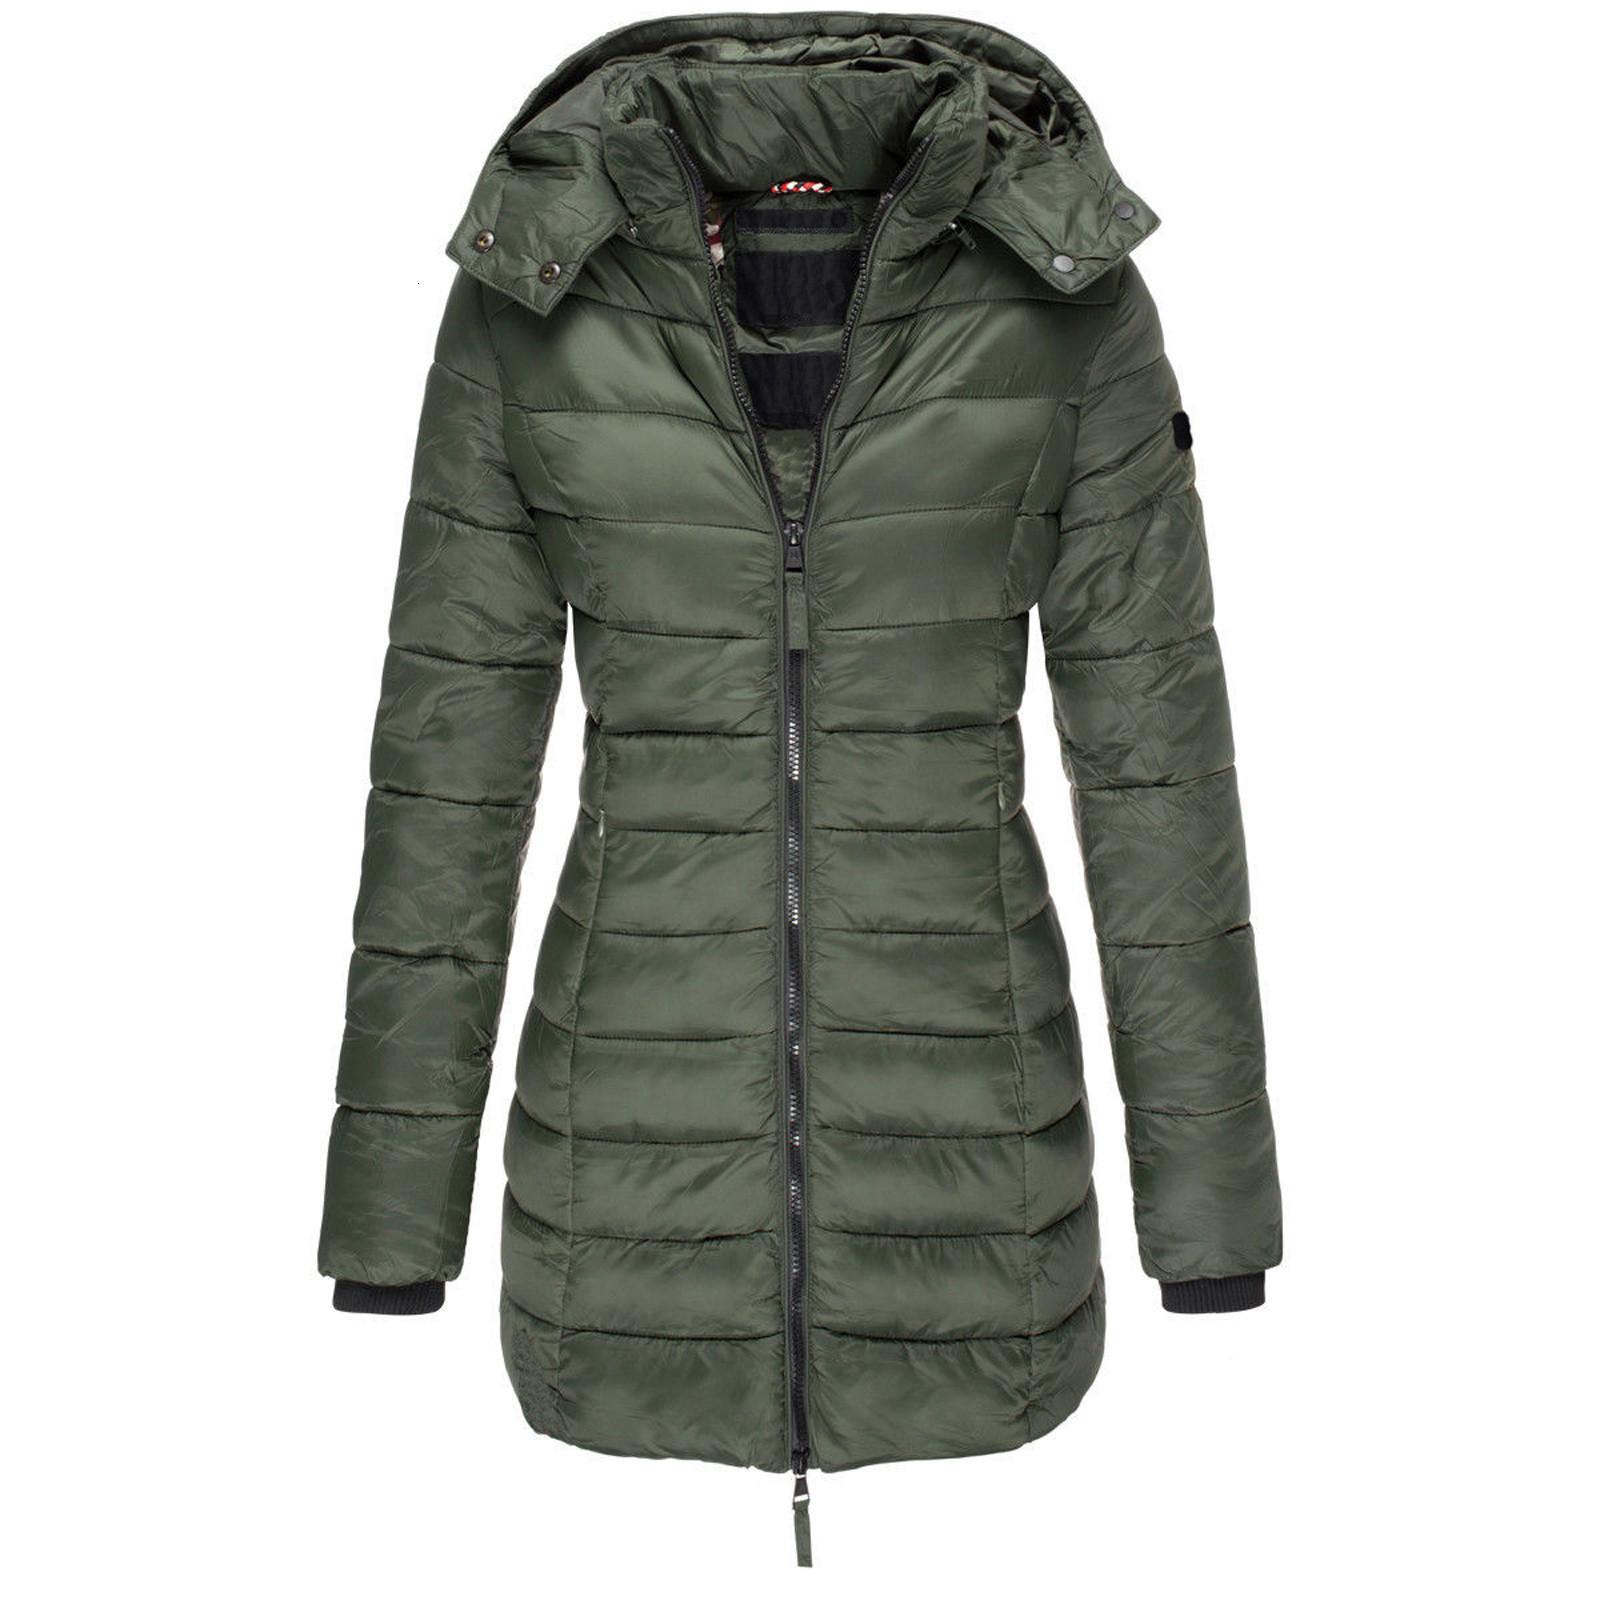 2020 Frauen Winter Donjackets Jacken Ultra Lange Heiße Pufferjacke Mit Kapuze Park Damen Kleidung